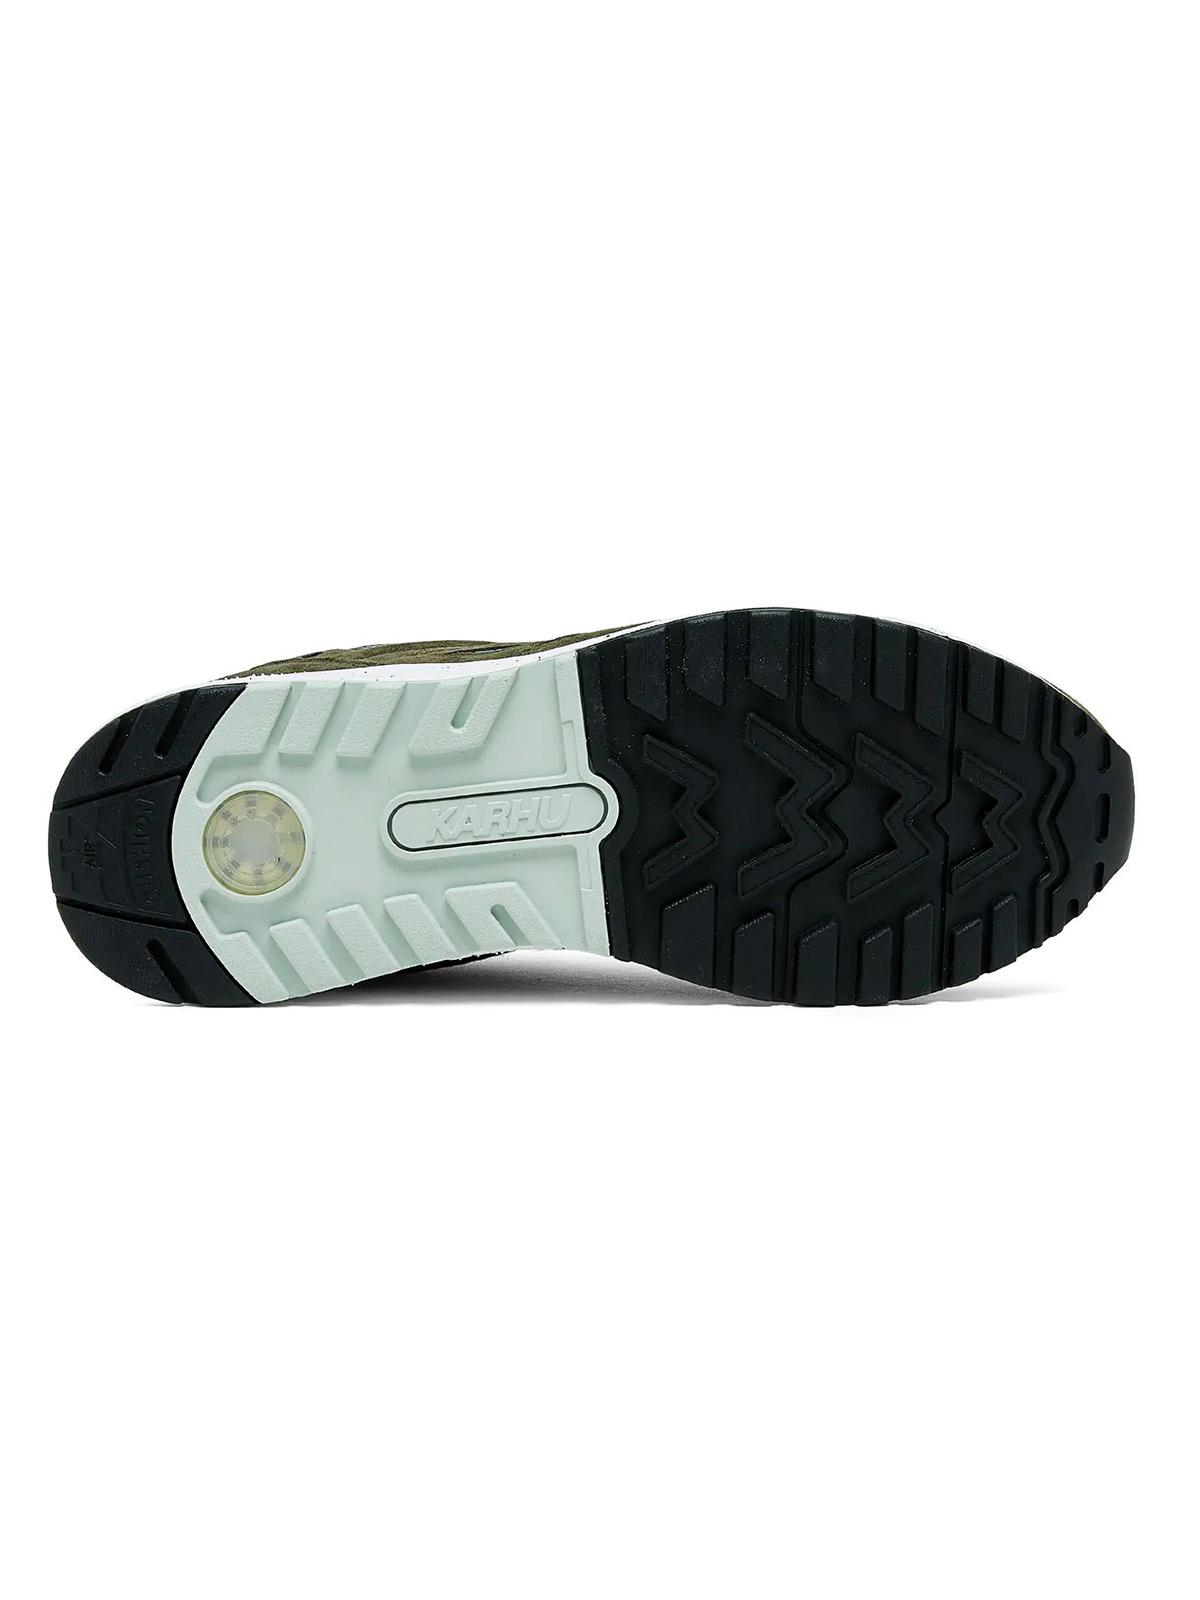 Picture of KARHU   Men's Legacy 96 Sneaker